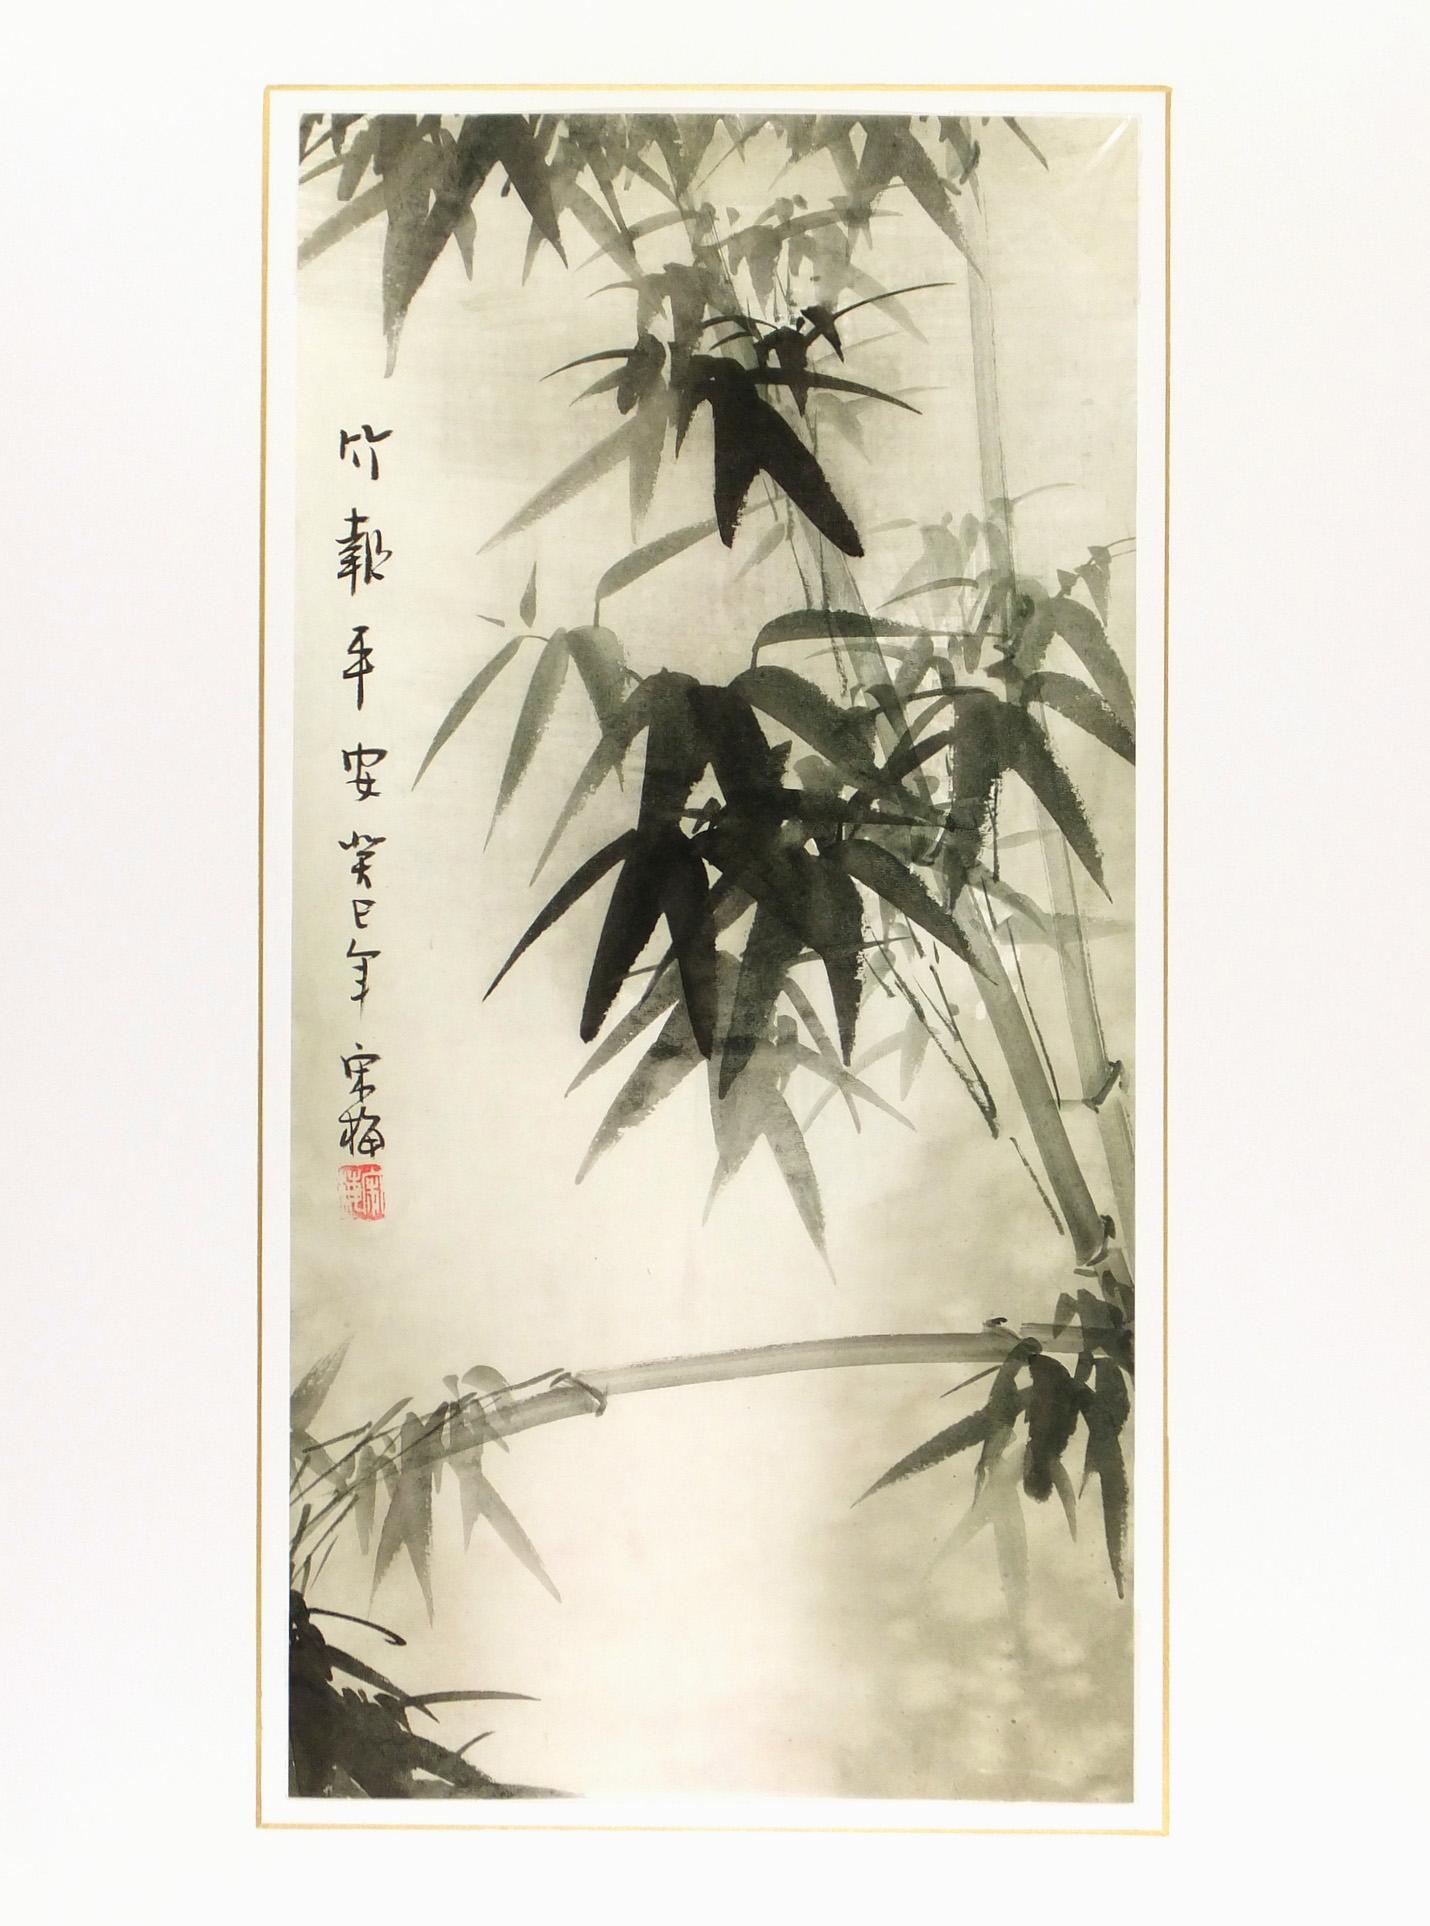 Chinese Serigraph - Bamboo Stalks-matted-6619K